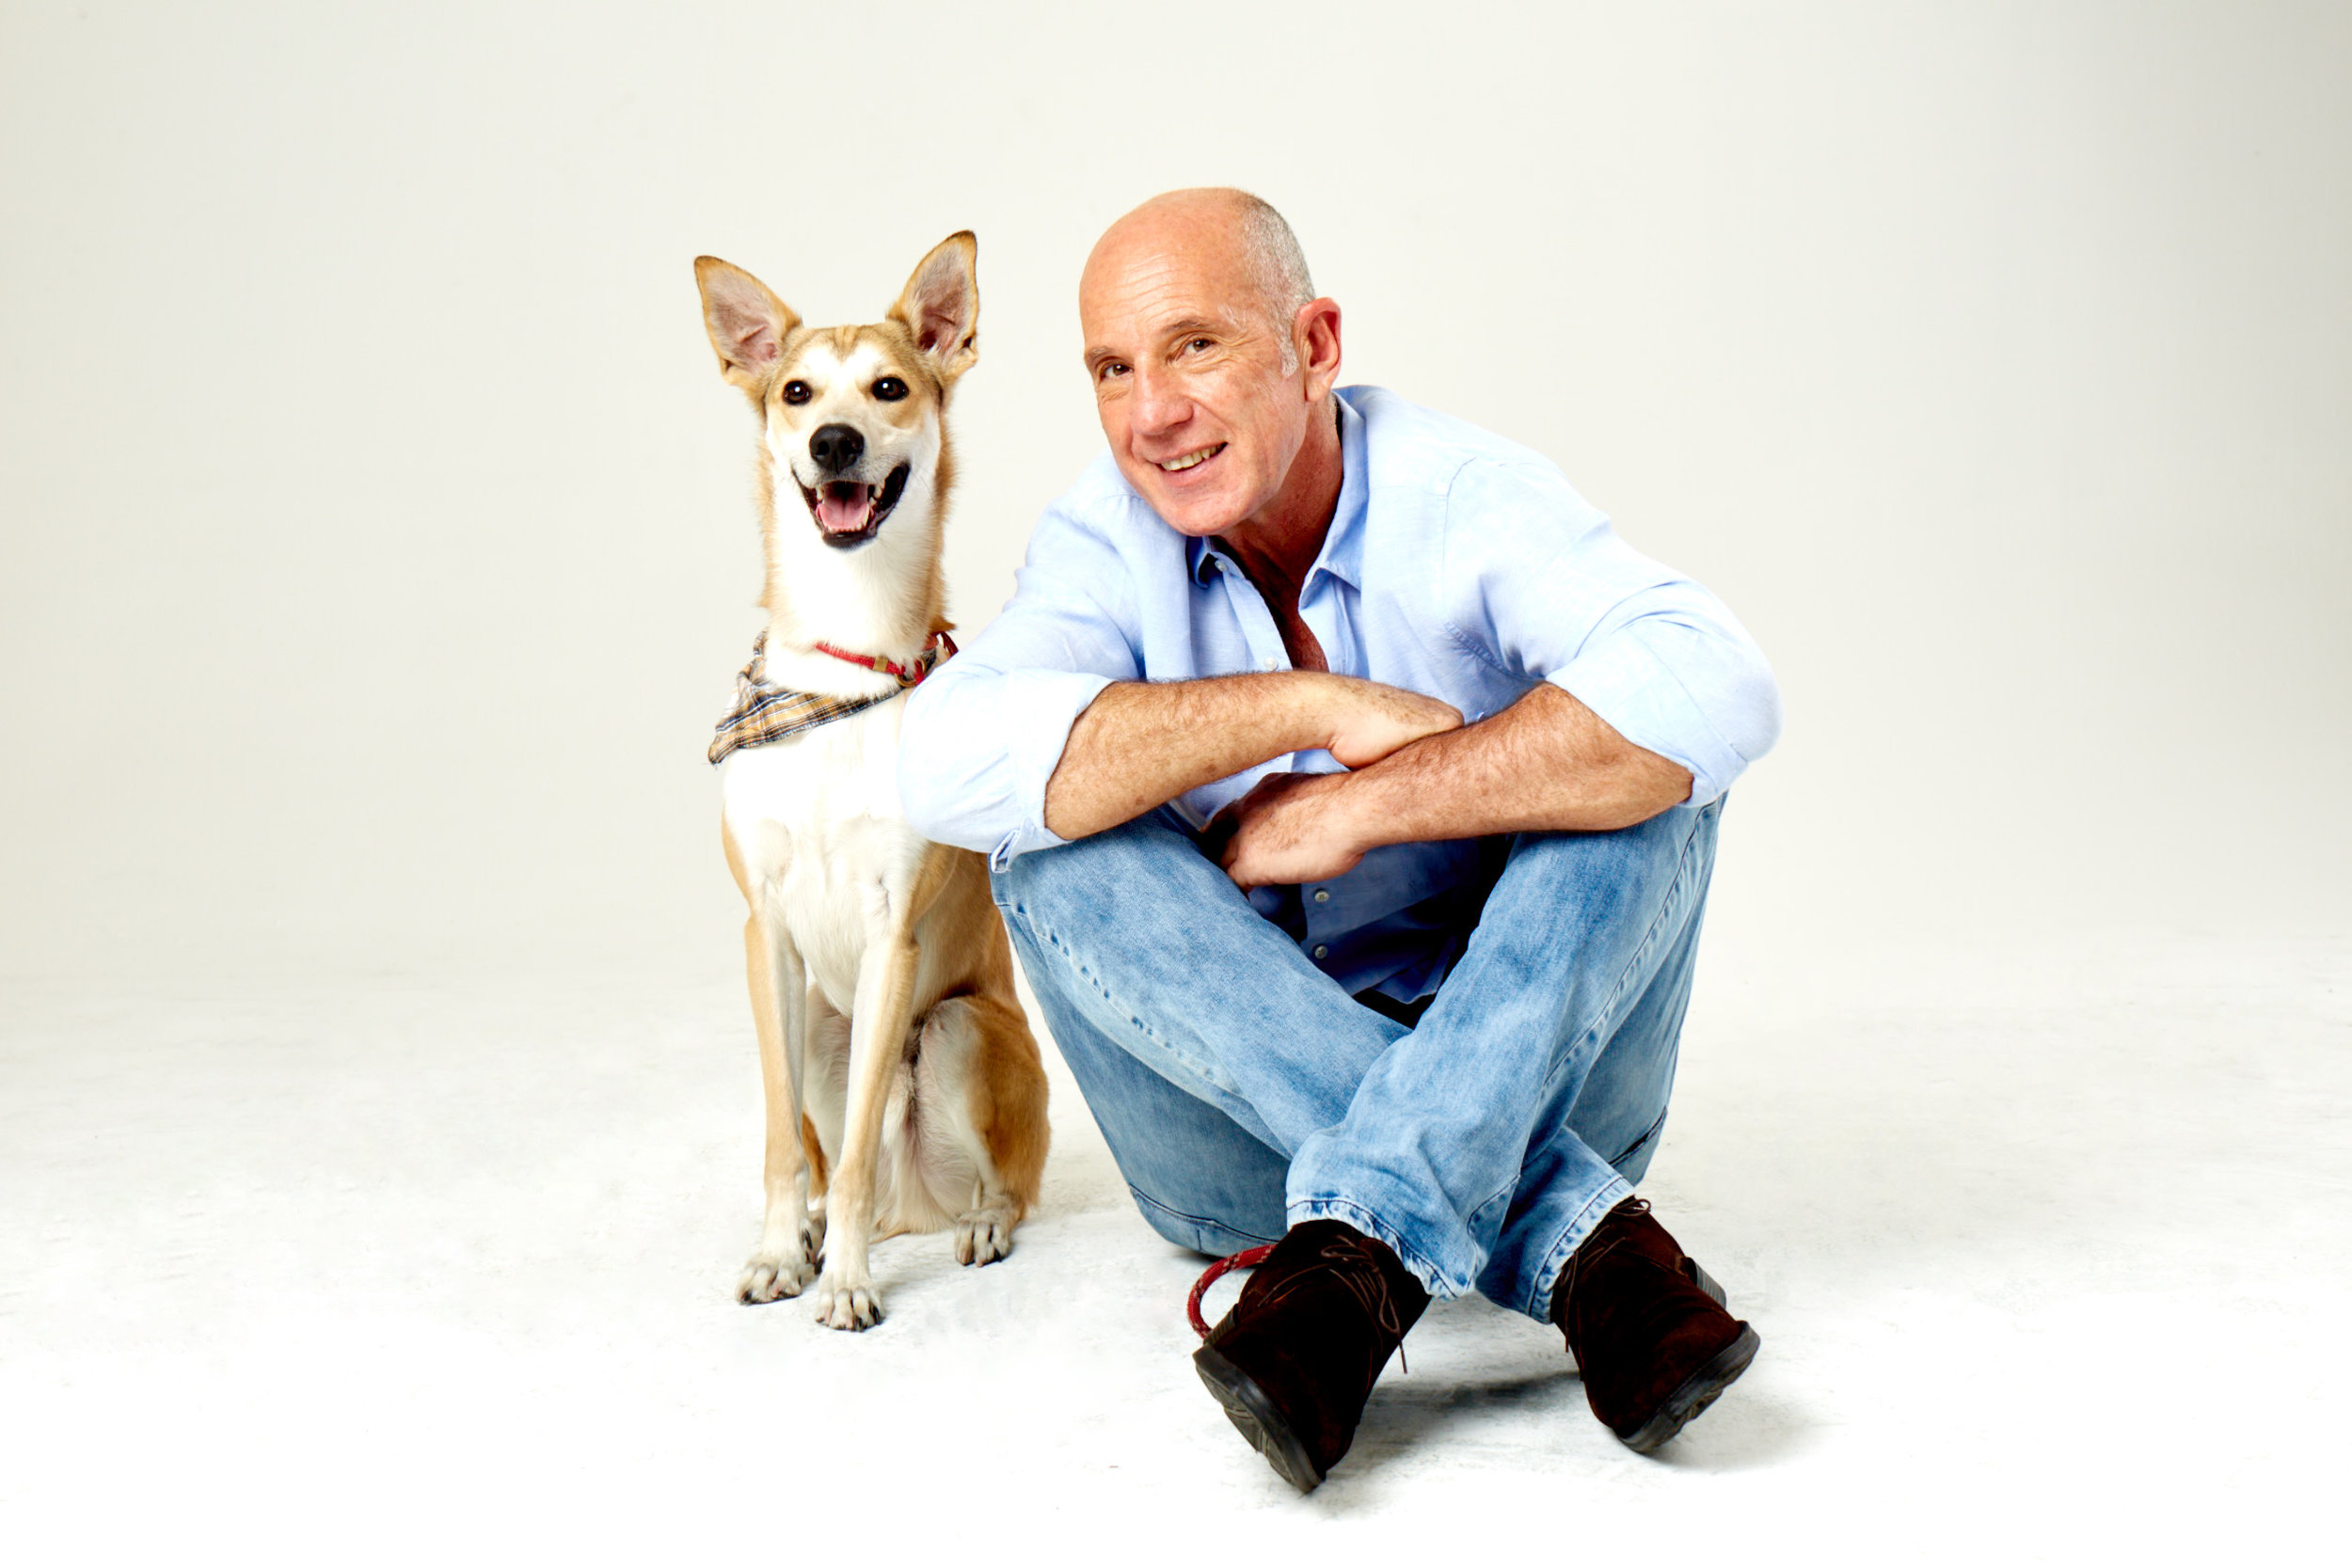 Xexéu Tripoli e seu cachorro. Atitudes a caminho do lixo zero.